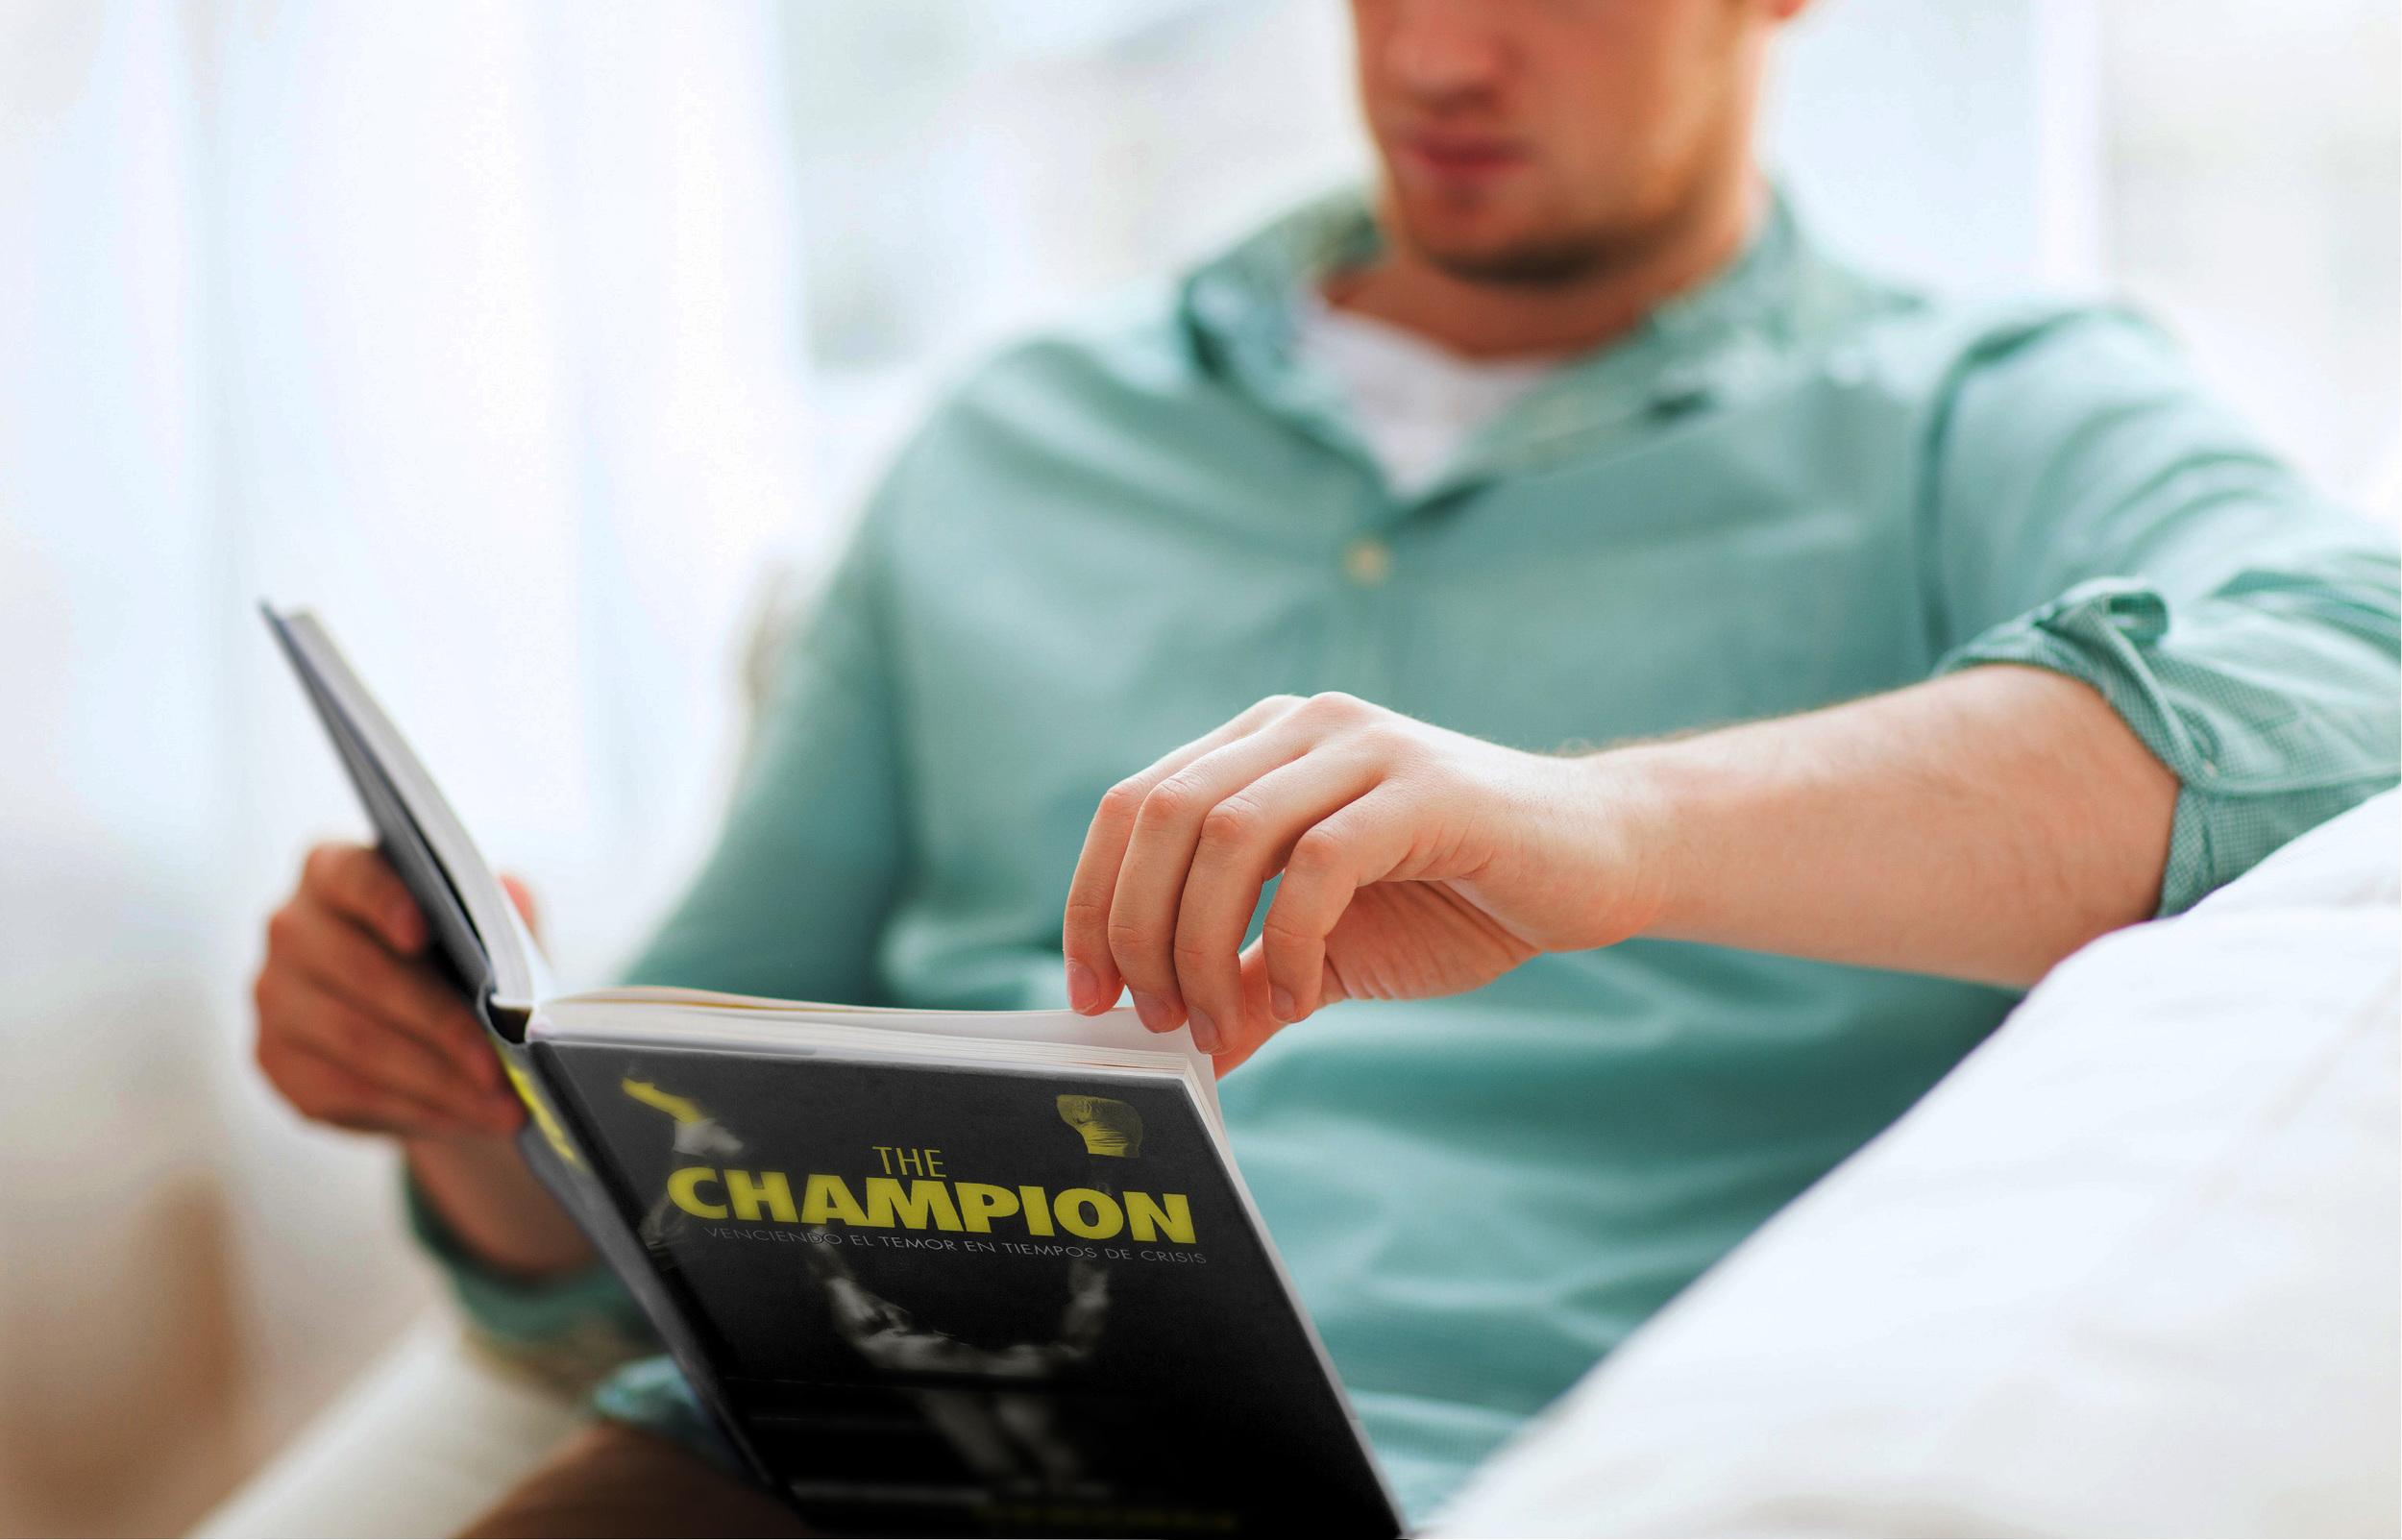 the-champion2.jpg